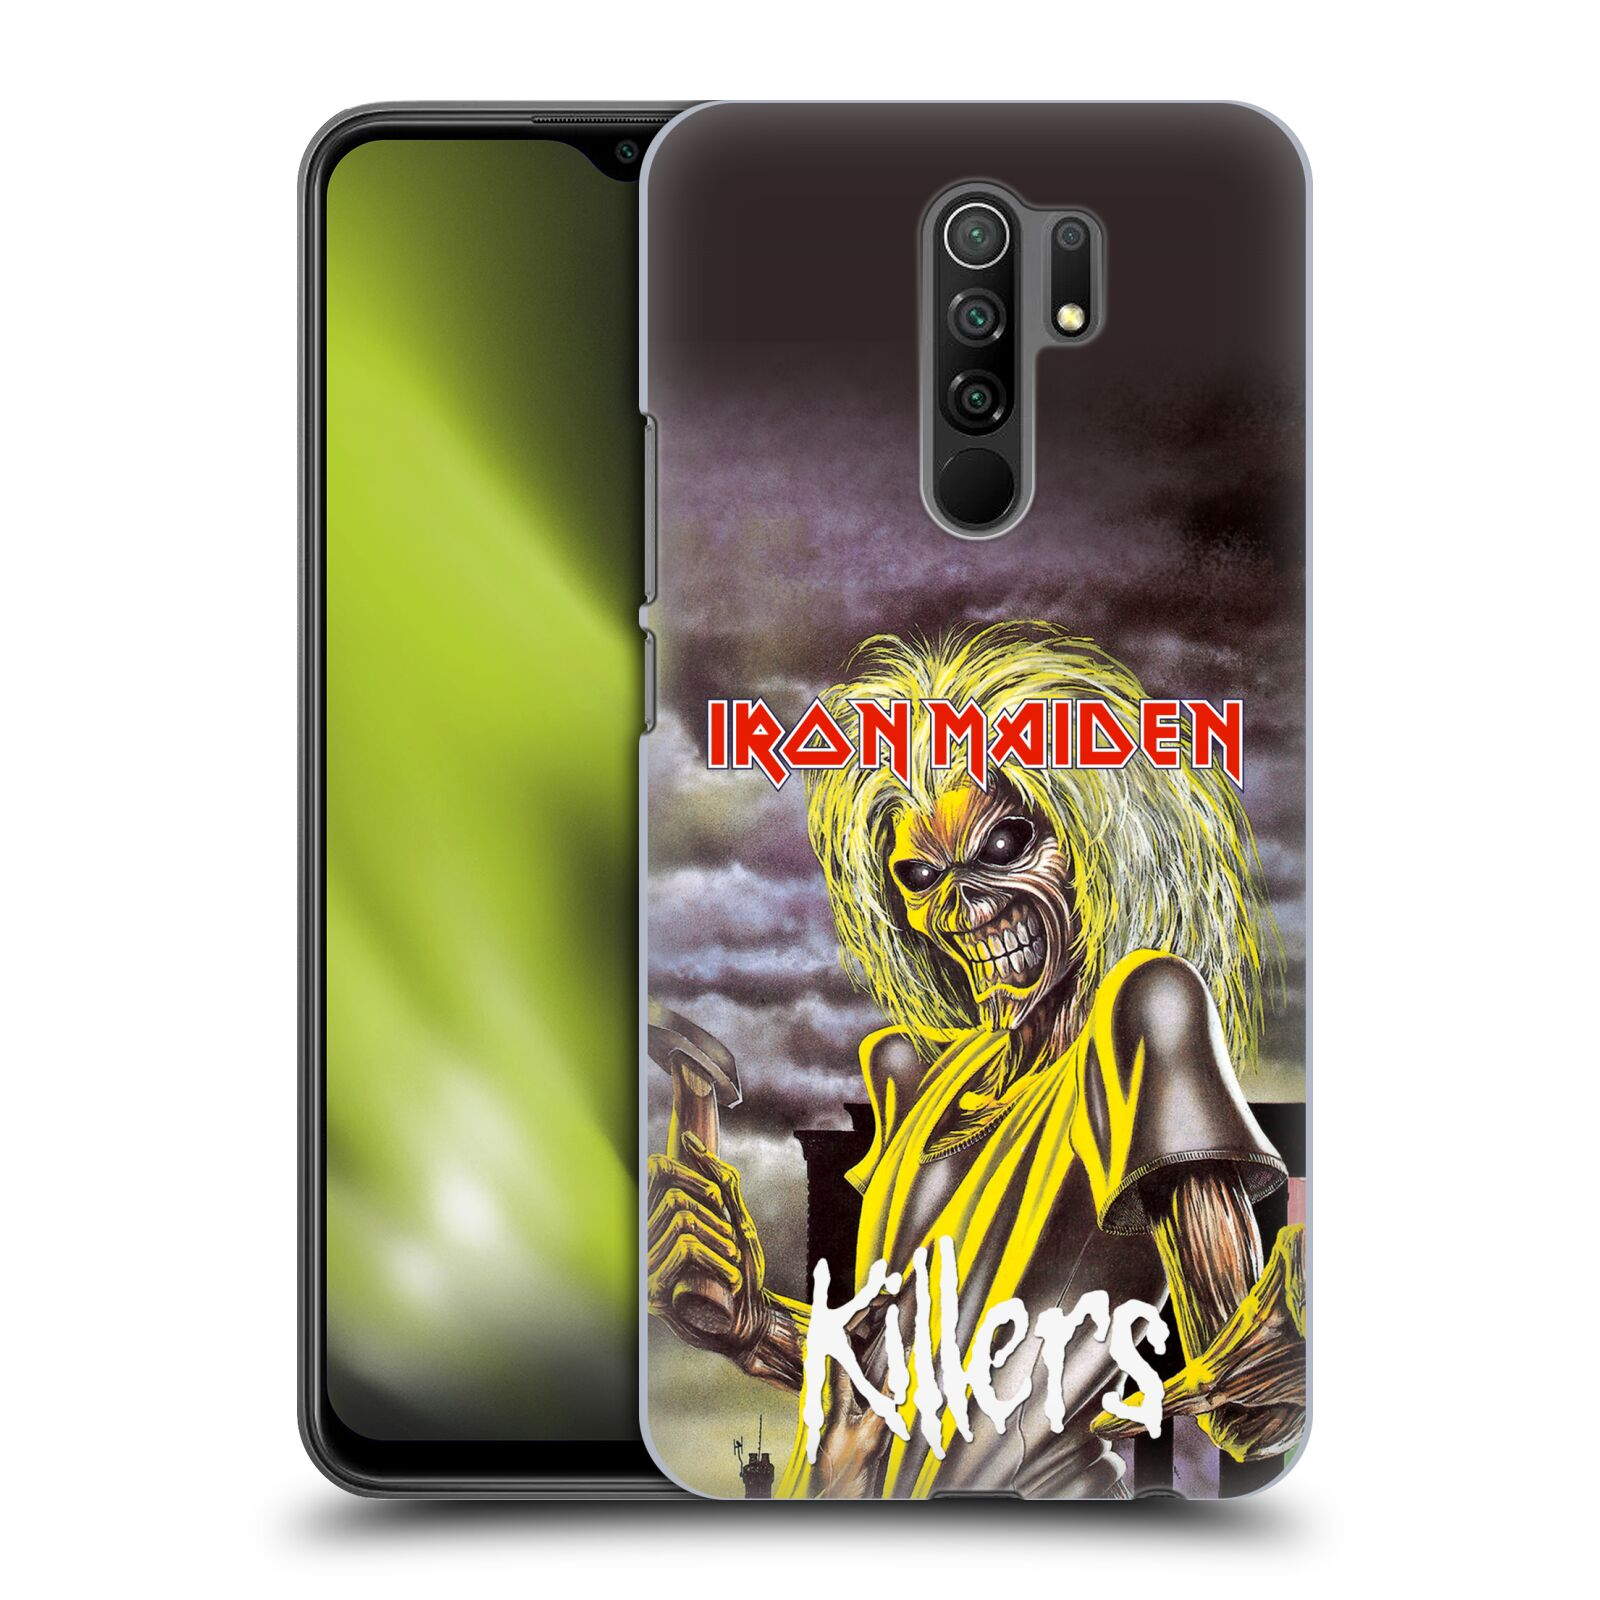 Plastové pouzdro na mobil Xiaomi Redmi 9 - Head Case - Iron Maiden - Killers